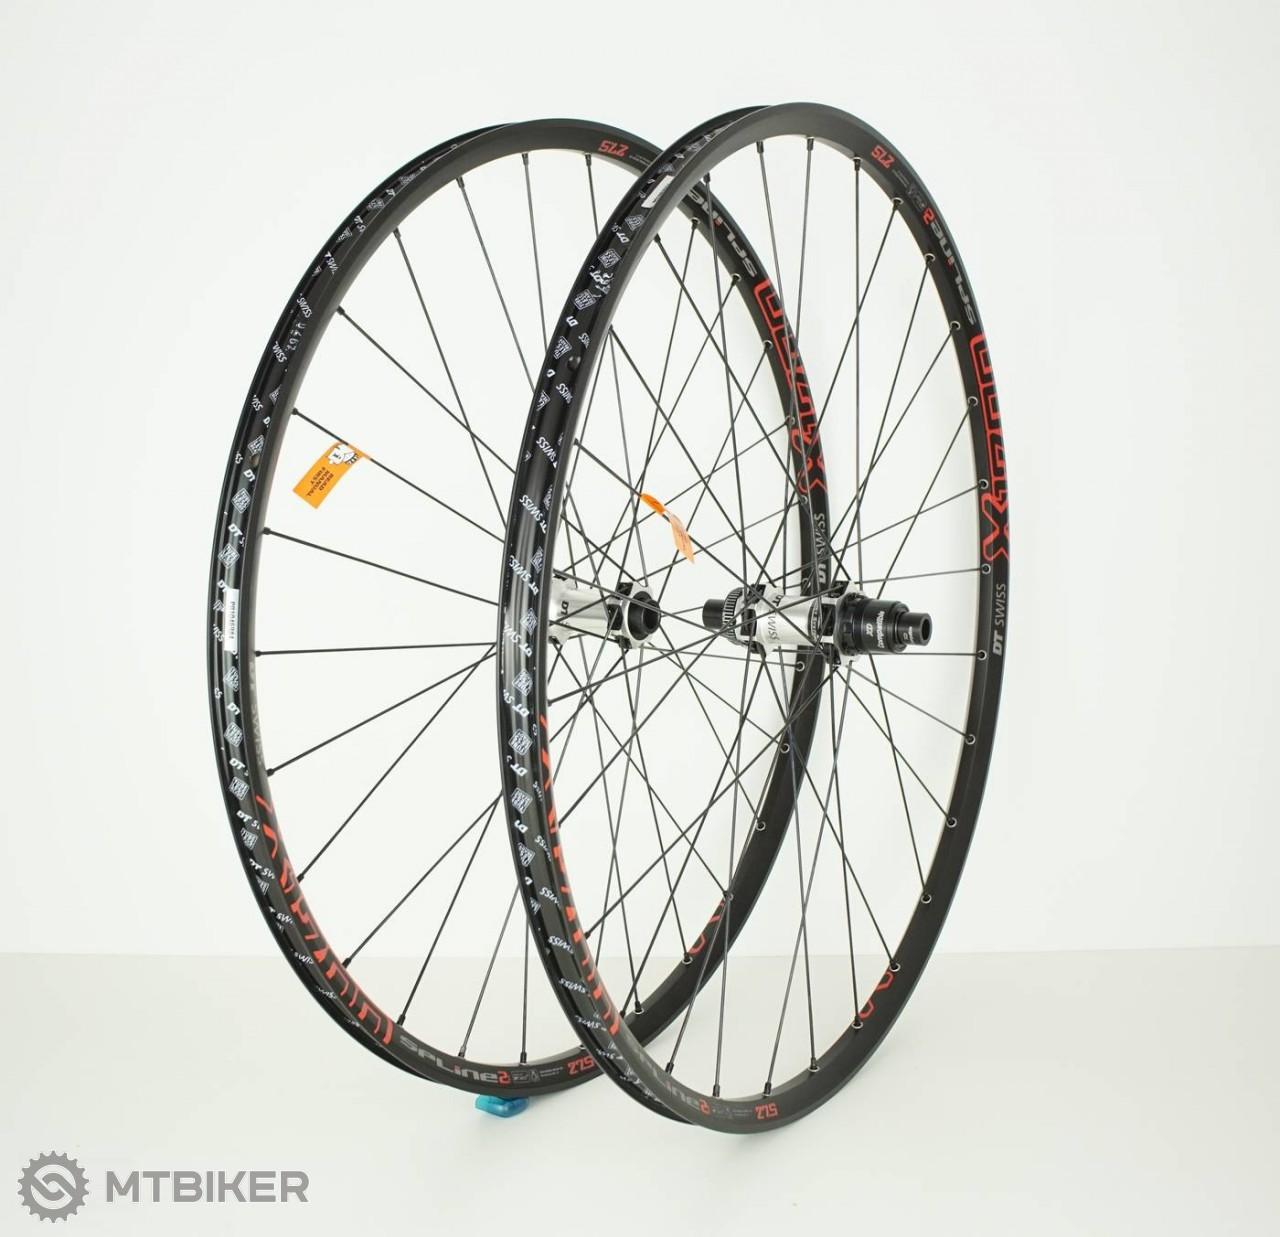 DT Swiss X1700 Spline Two 29